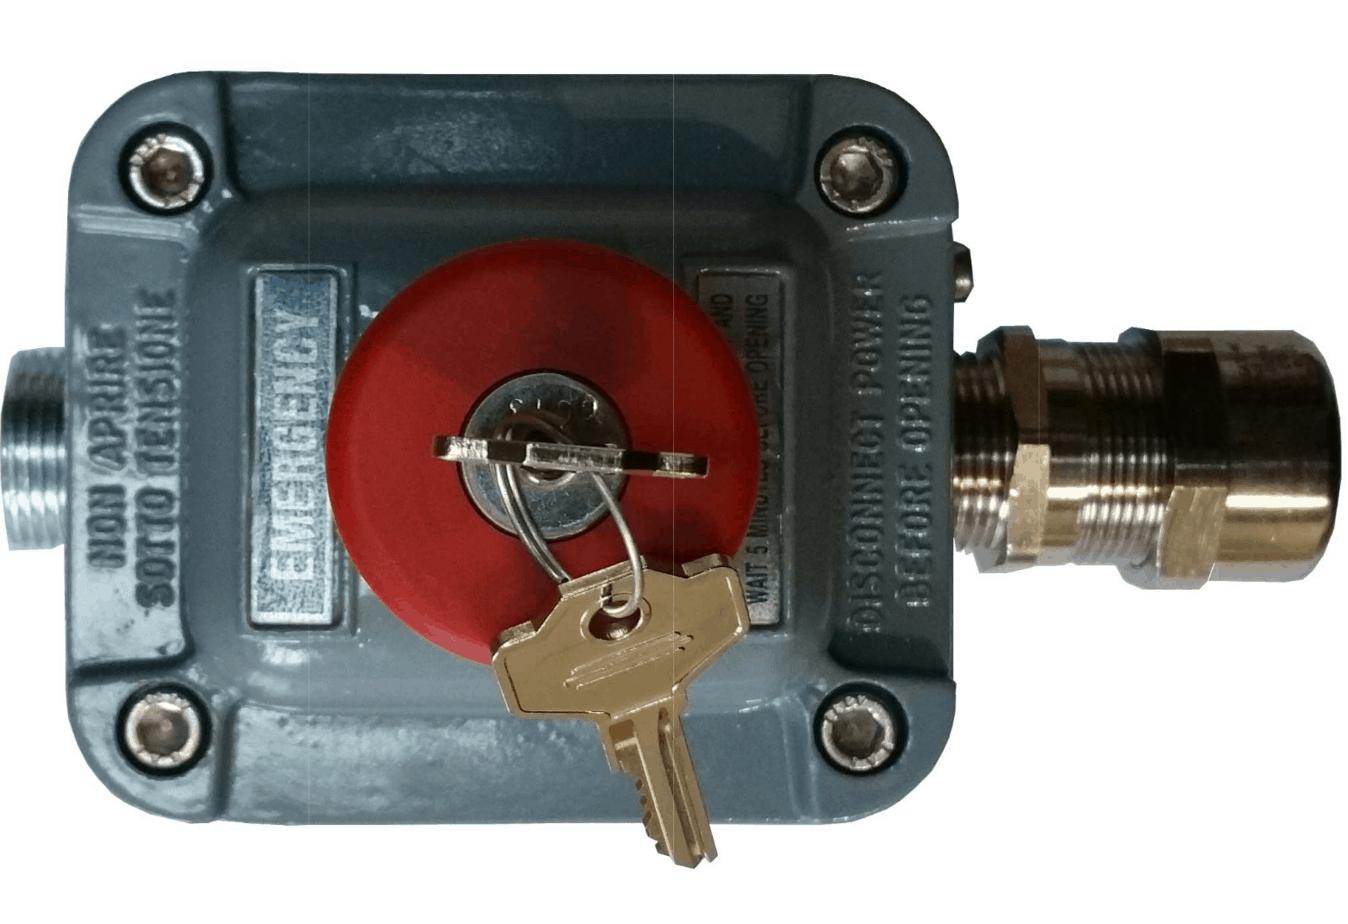 PB1-8k Emergency pushbutton with key